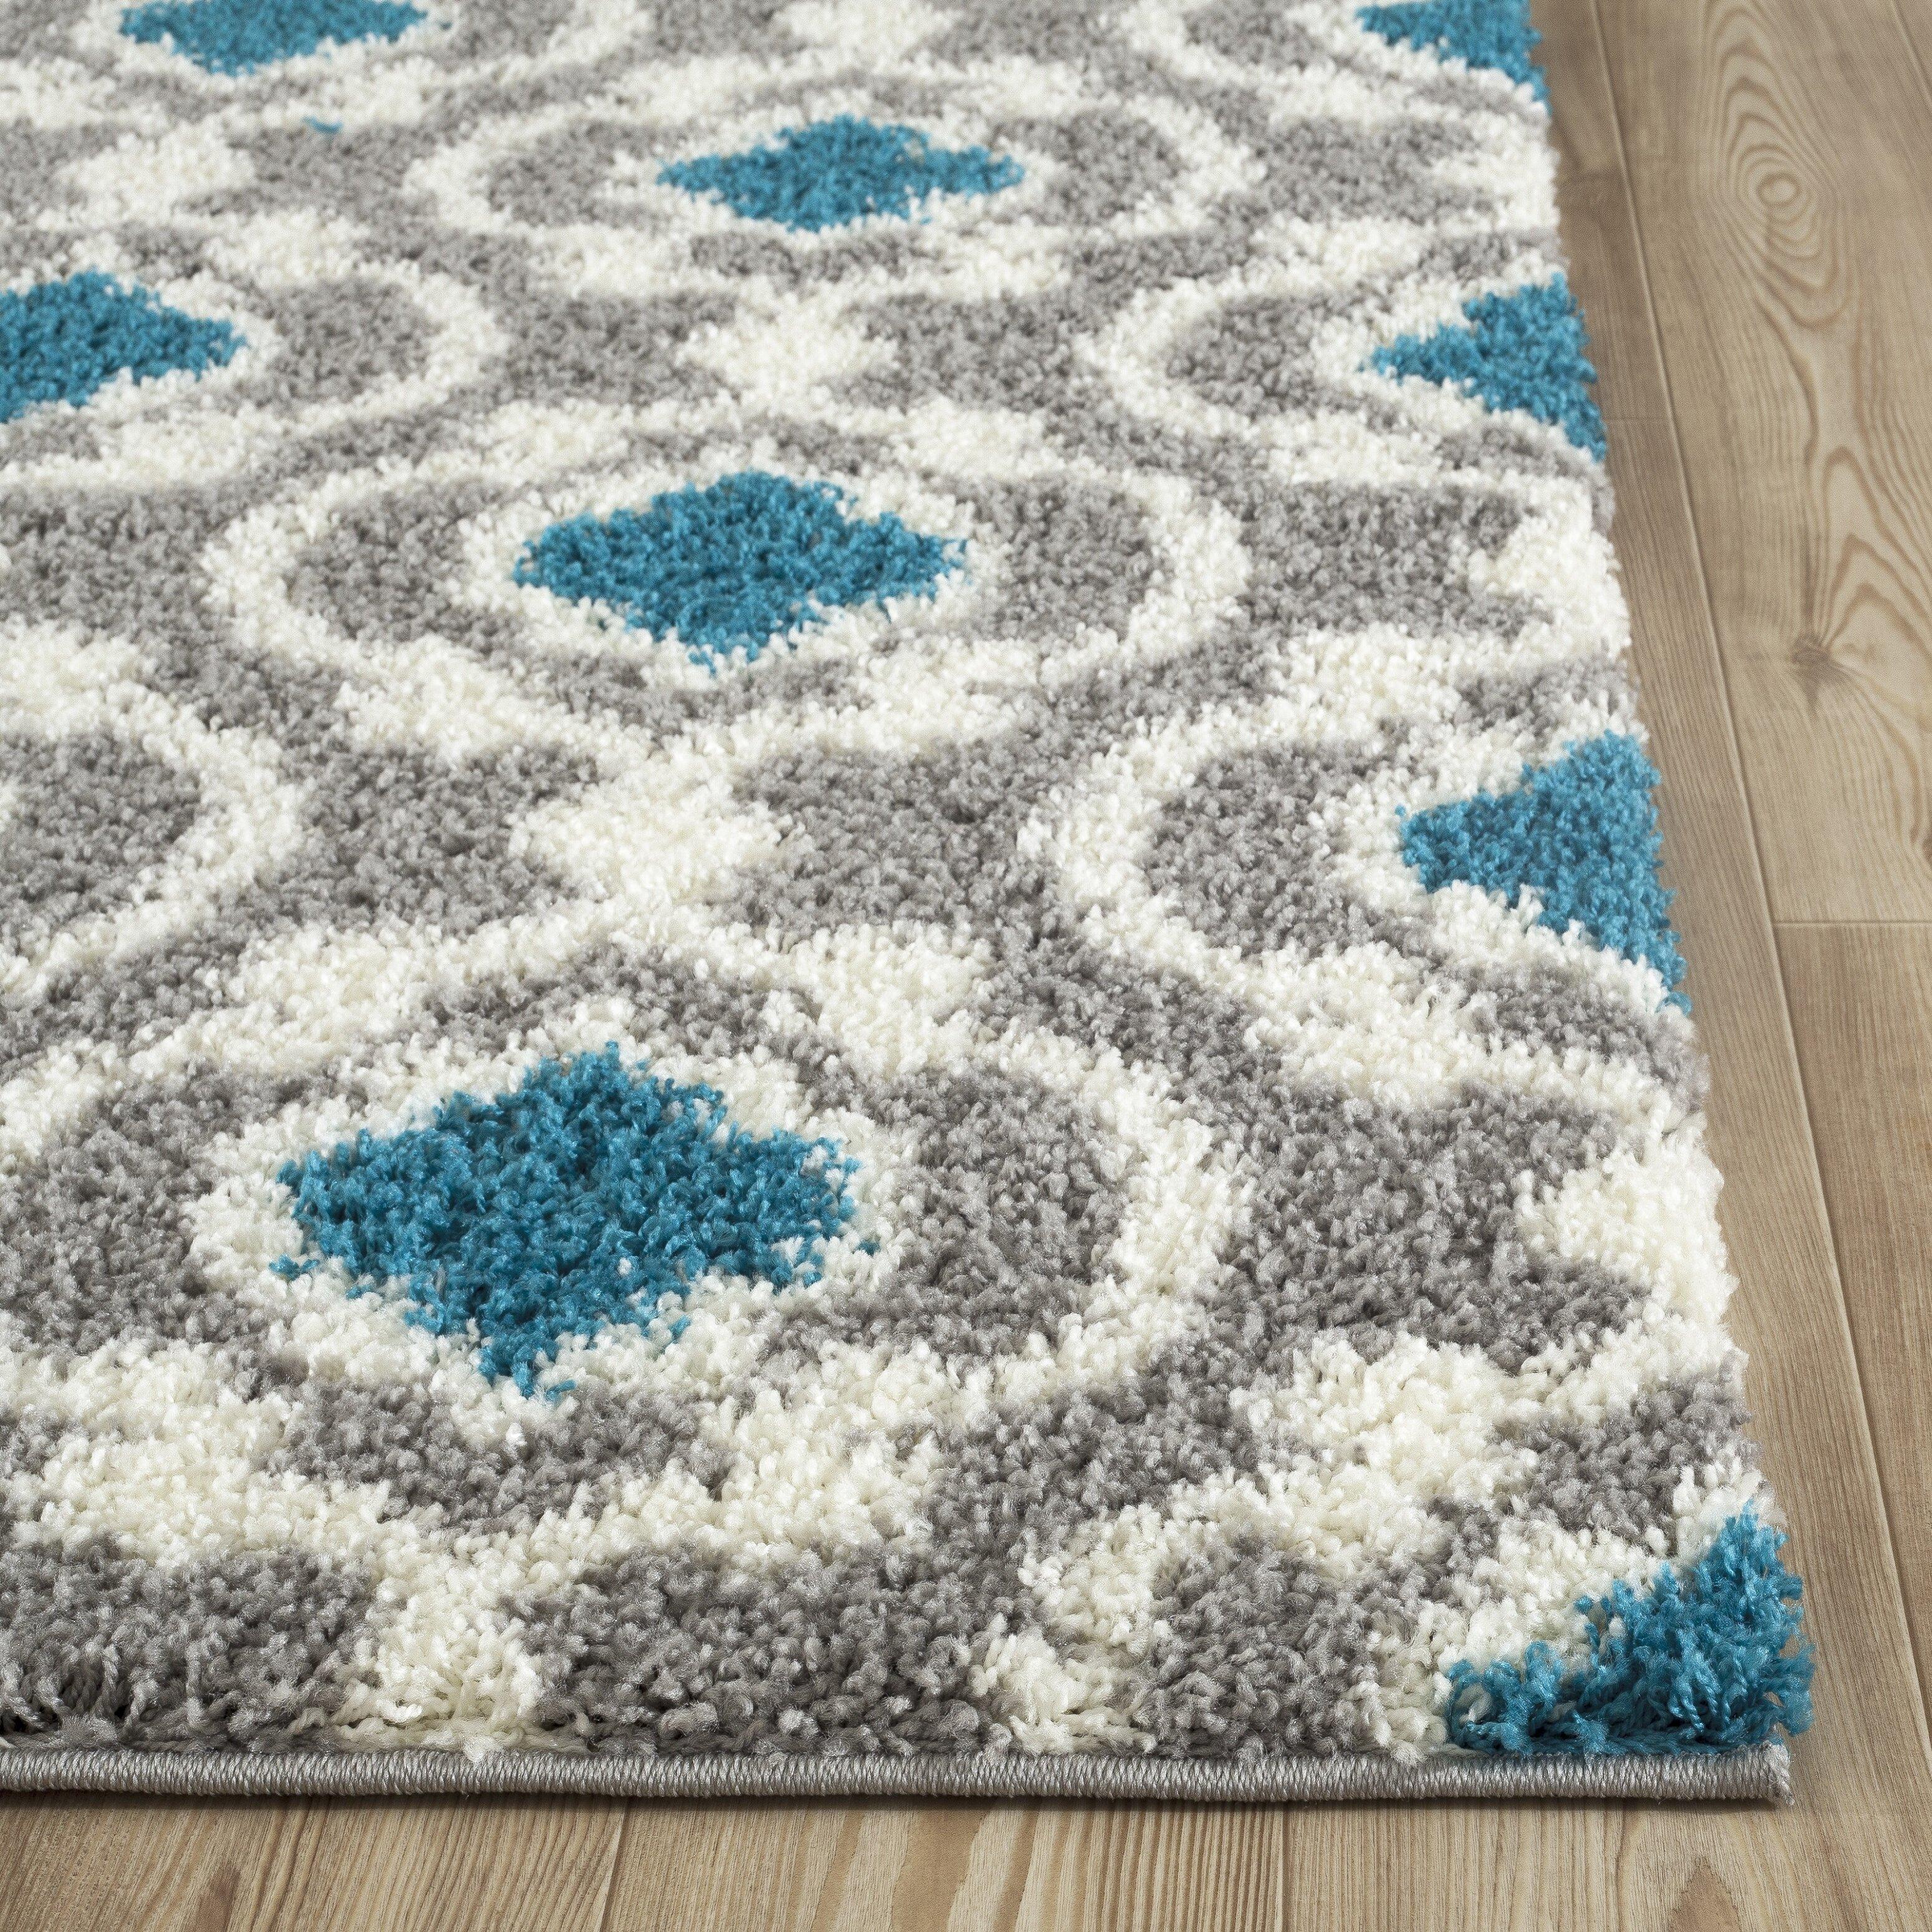 World rug gallery florida gray turquoise area rug for Turquoise area rug